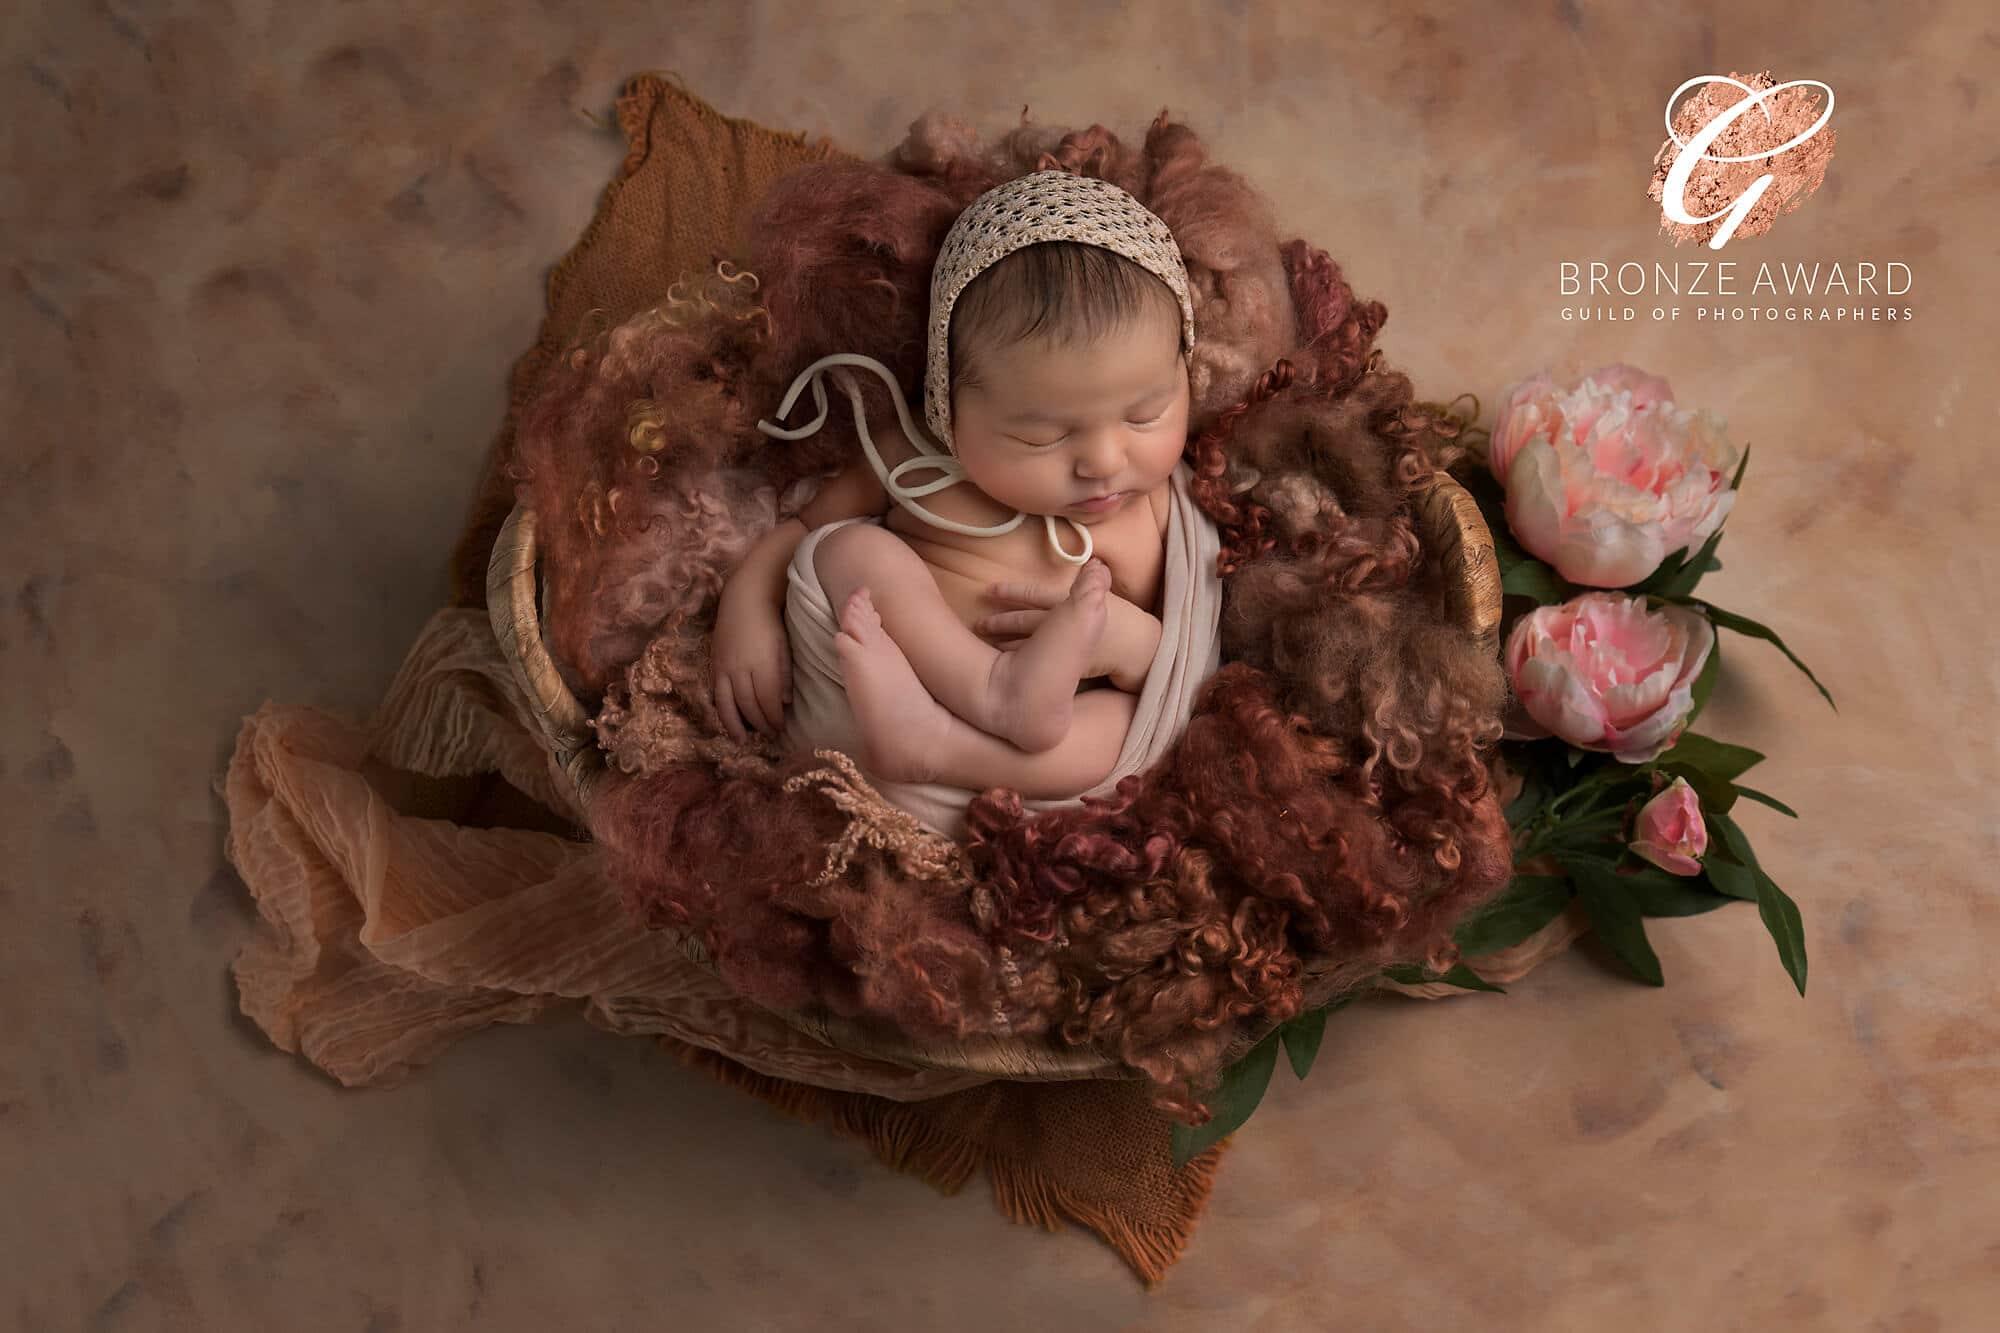 newborn baby girl with flowers